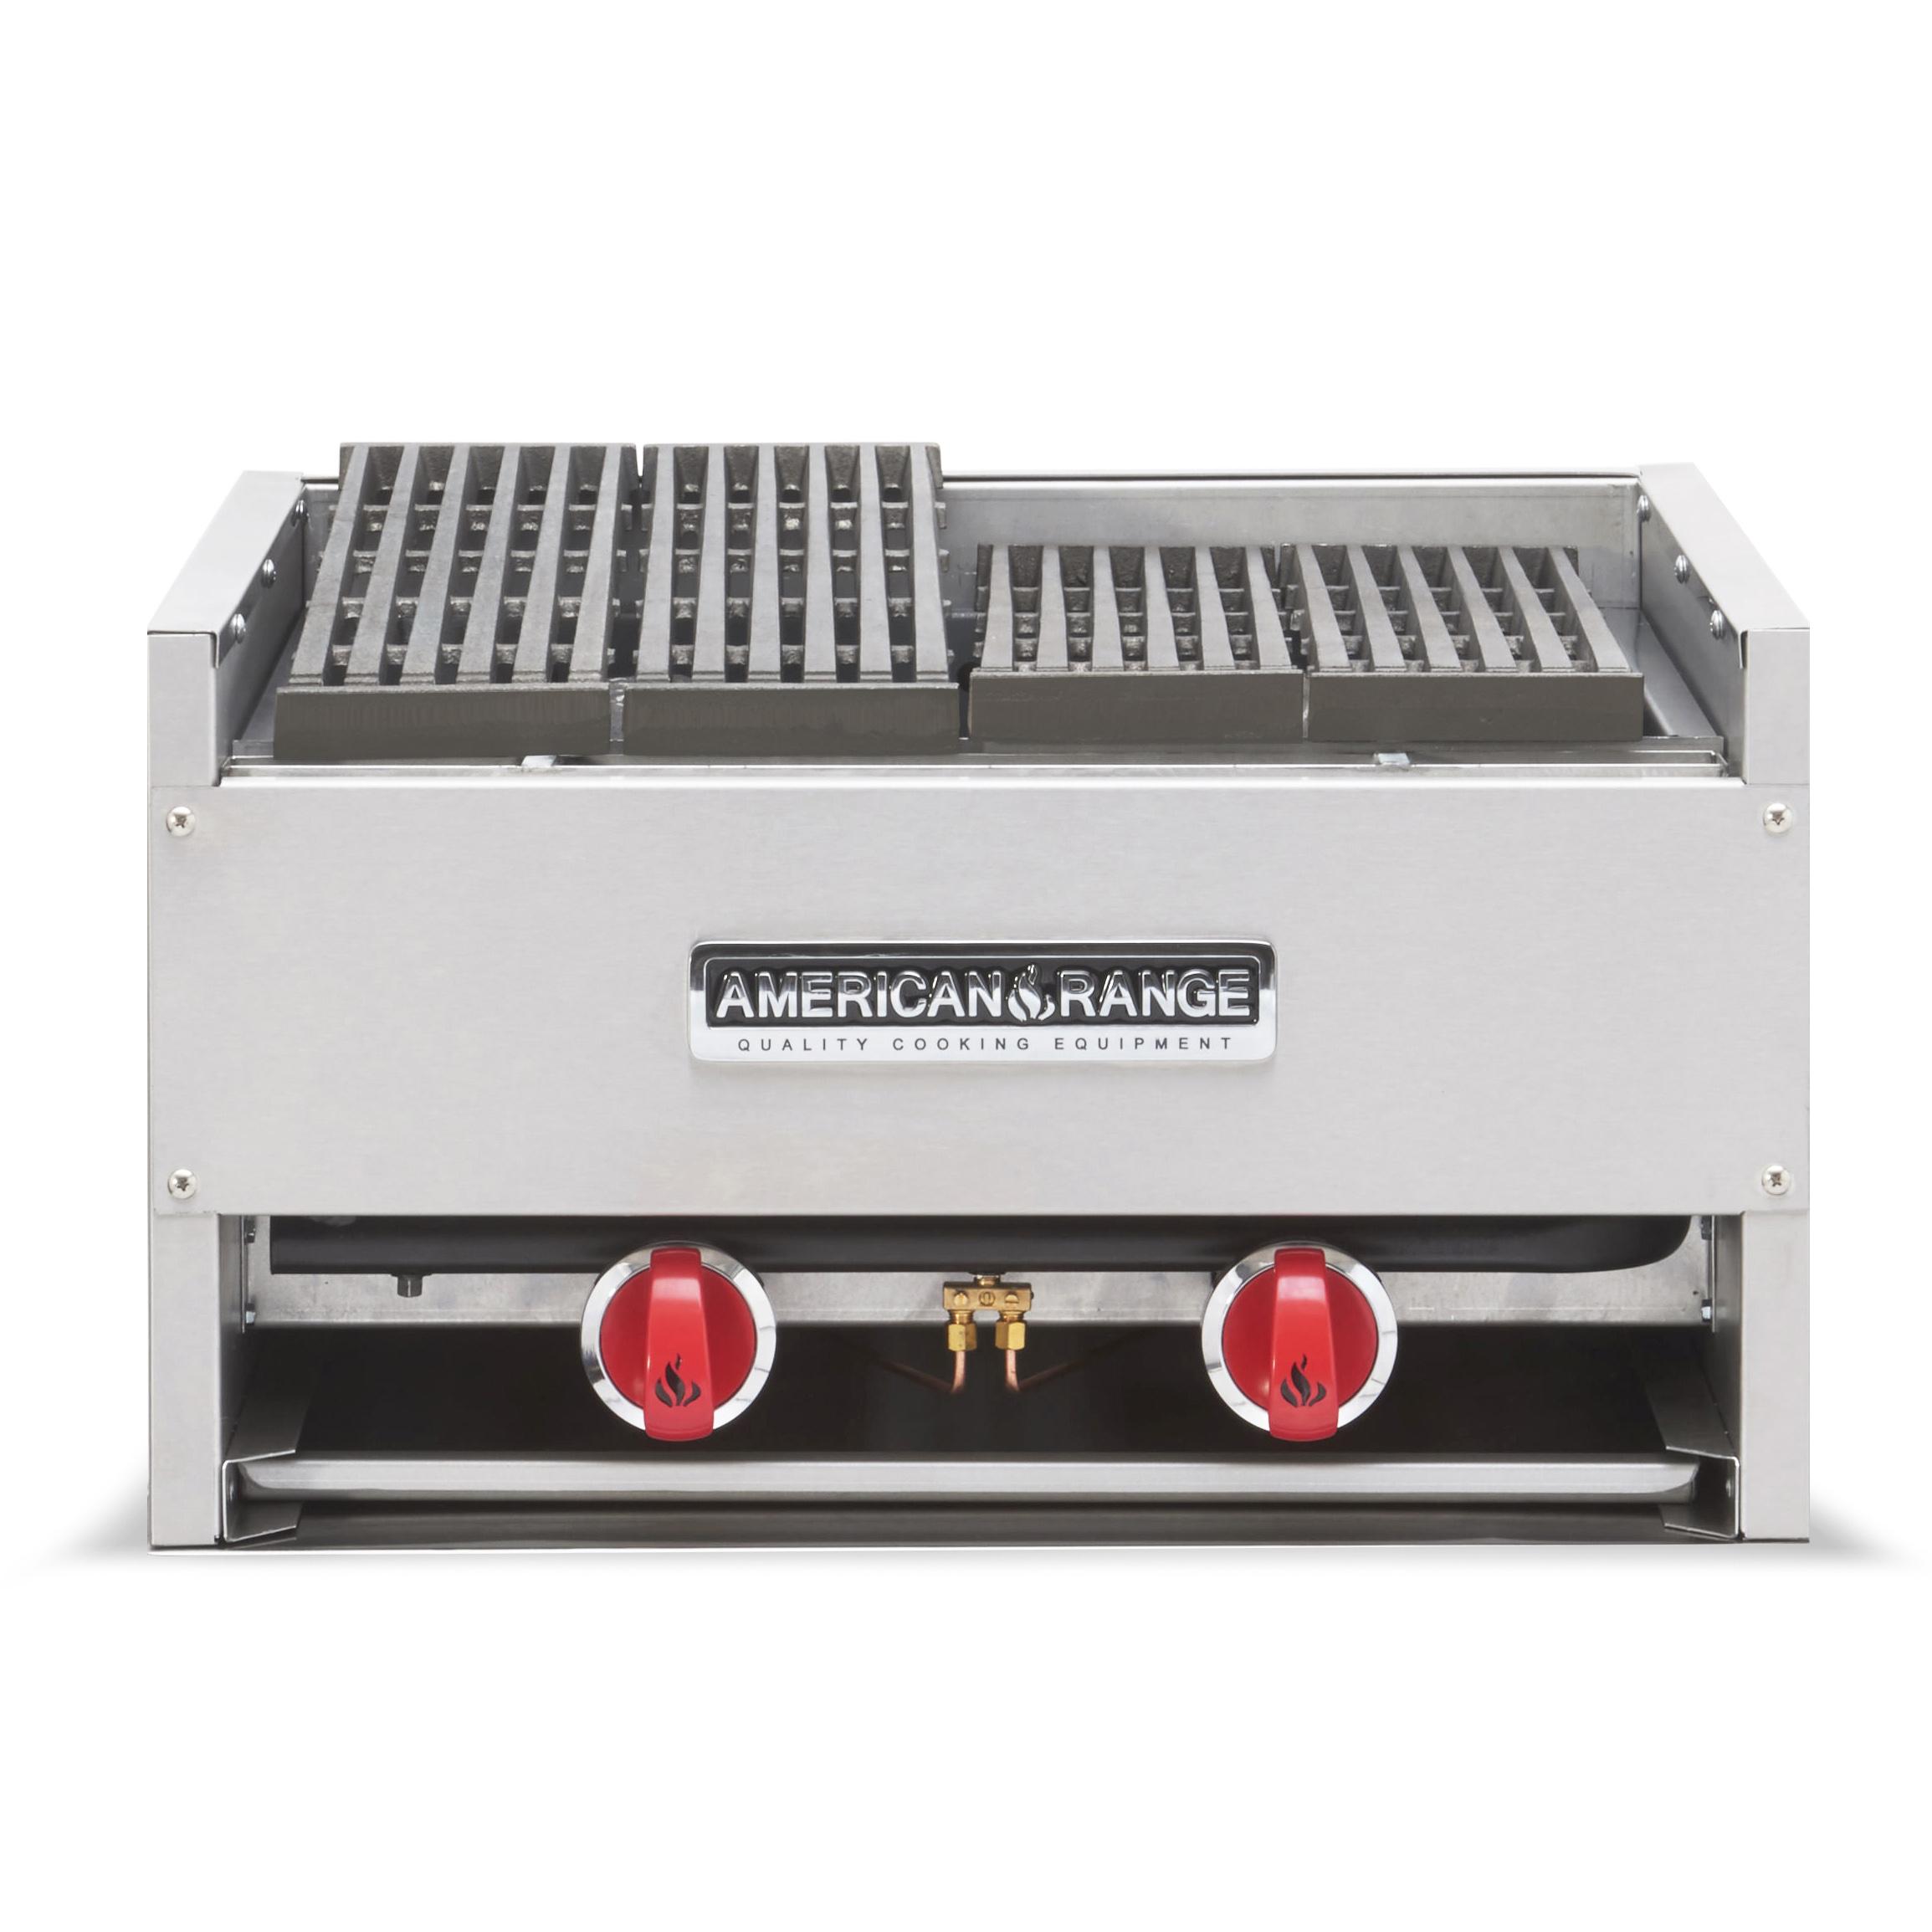 American Range AECB-84 charbroiler, gas, countertop